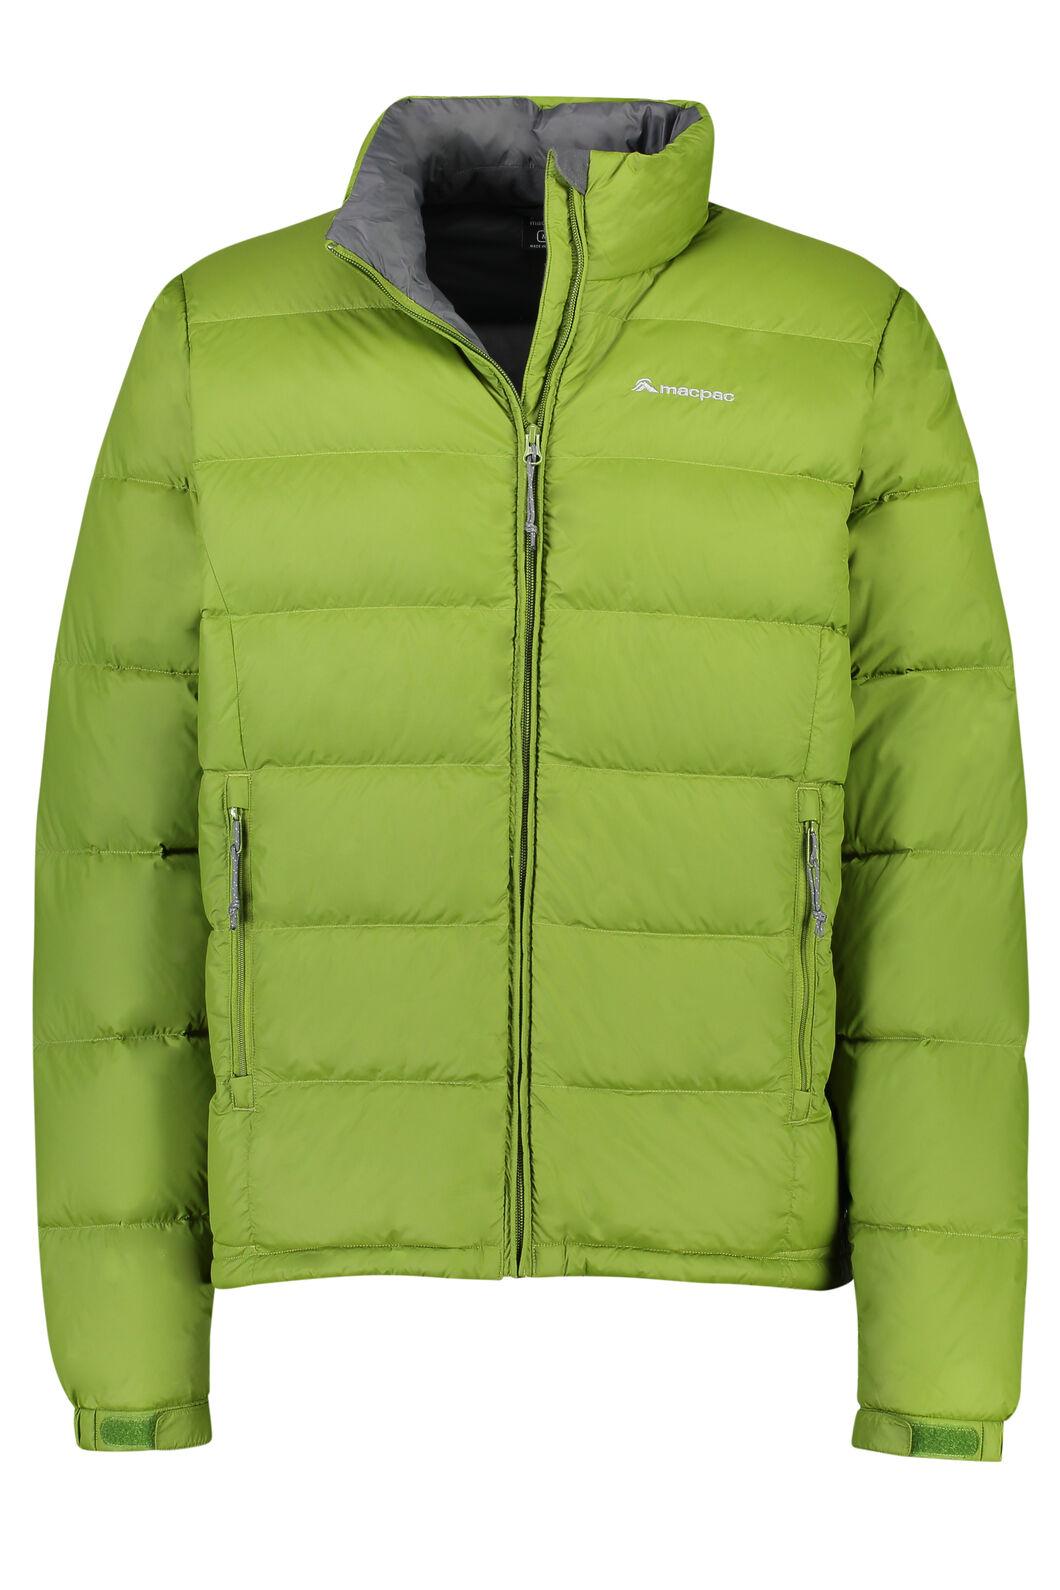 Halo Down Jacket - Men's, Cedar Green, hi-res